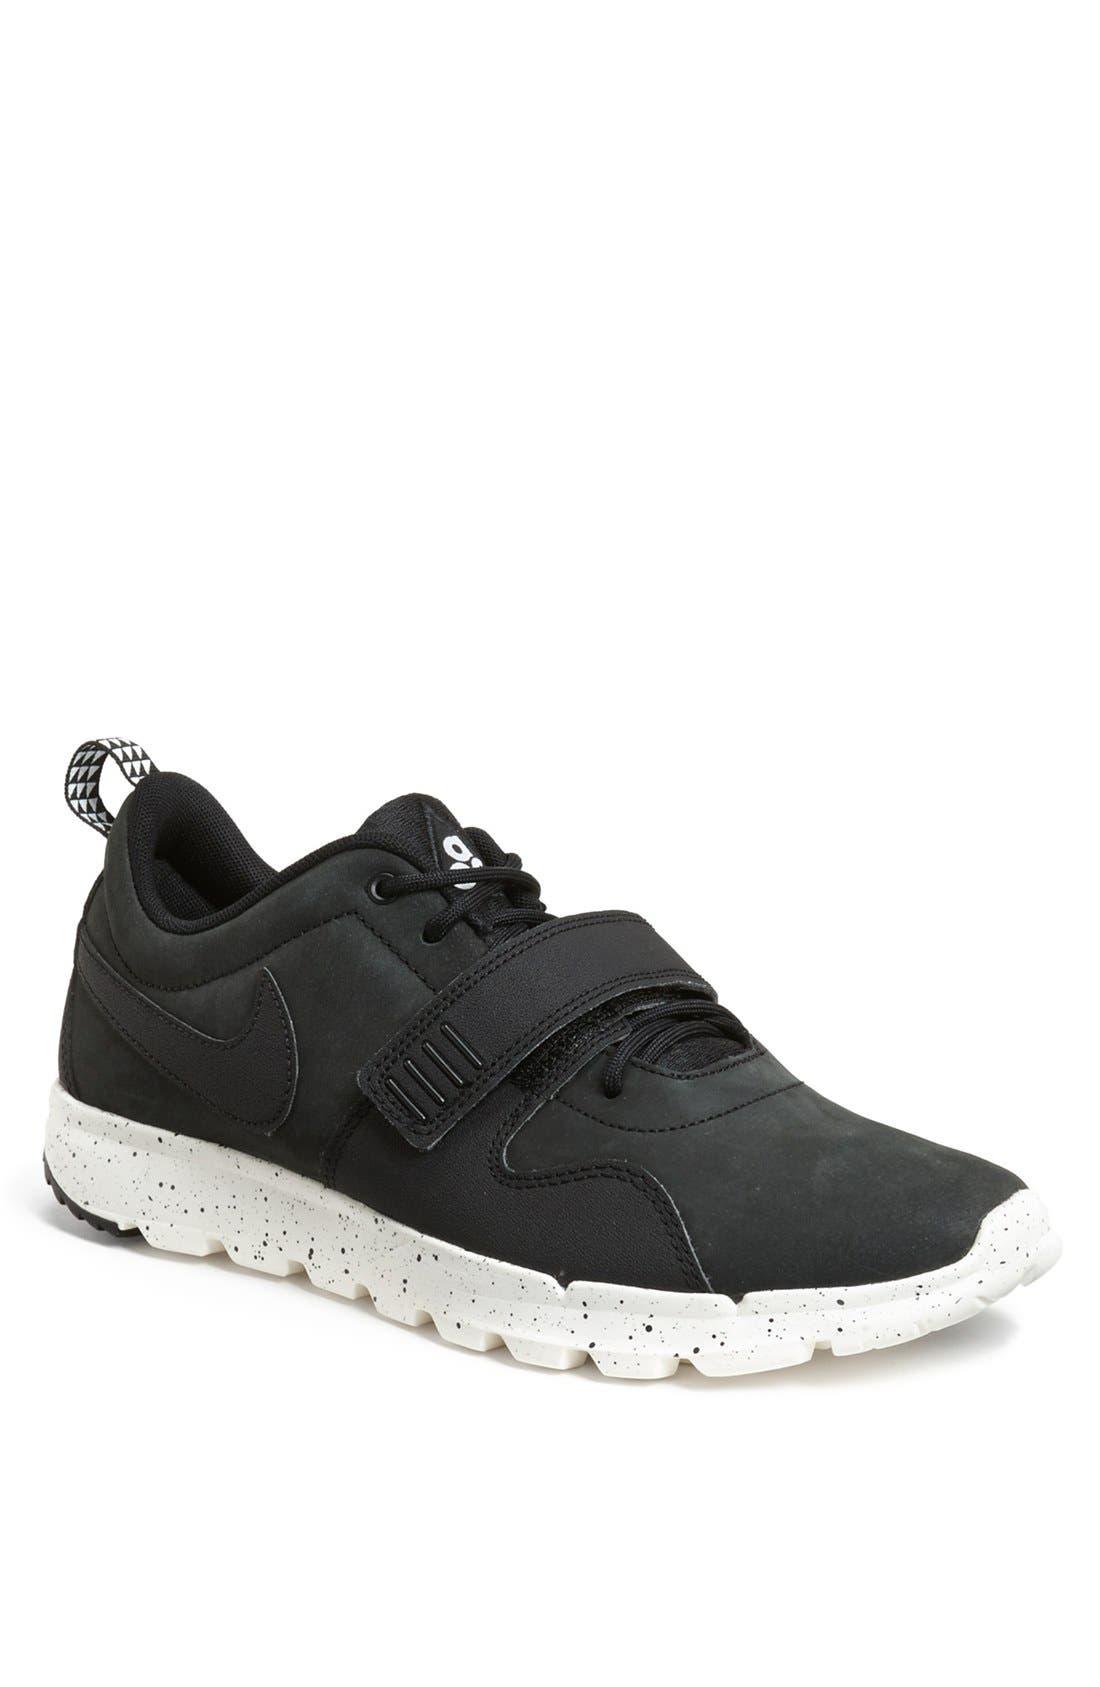 Alternate Image 1 Selected - Nike 'Trainerendor' Training Shoe (Men)